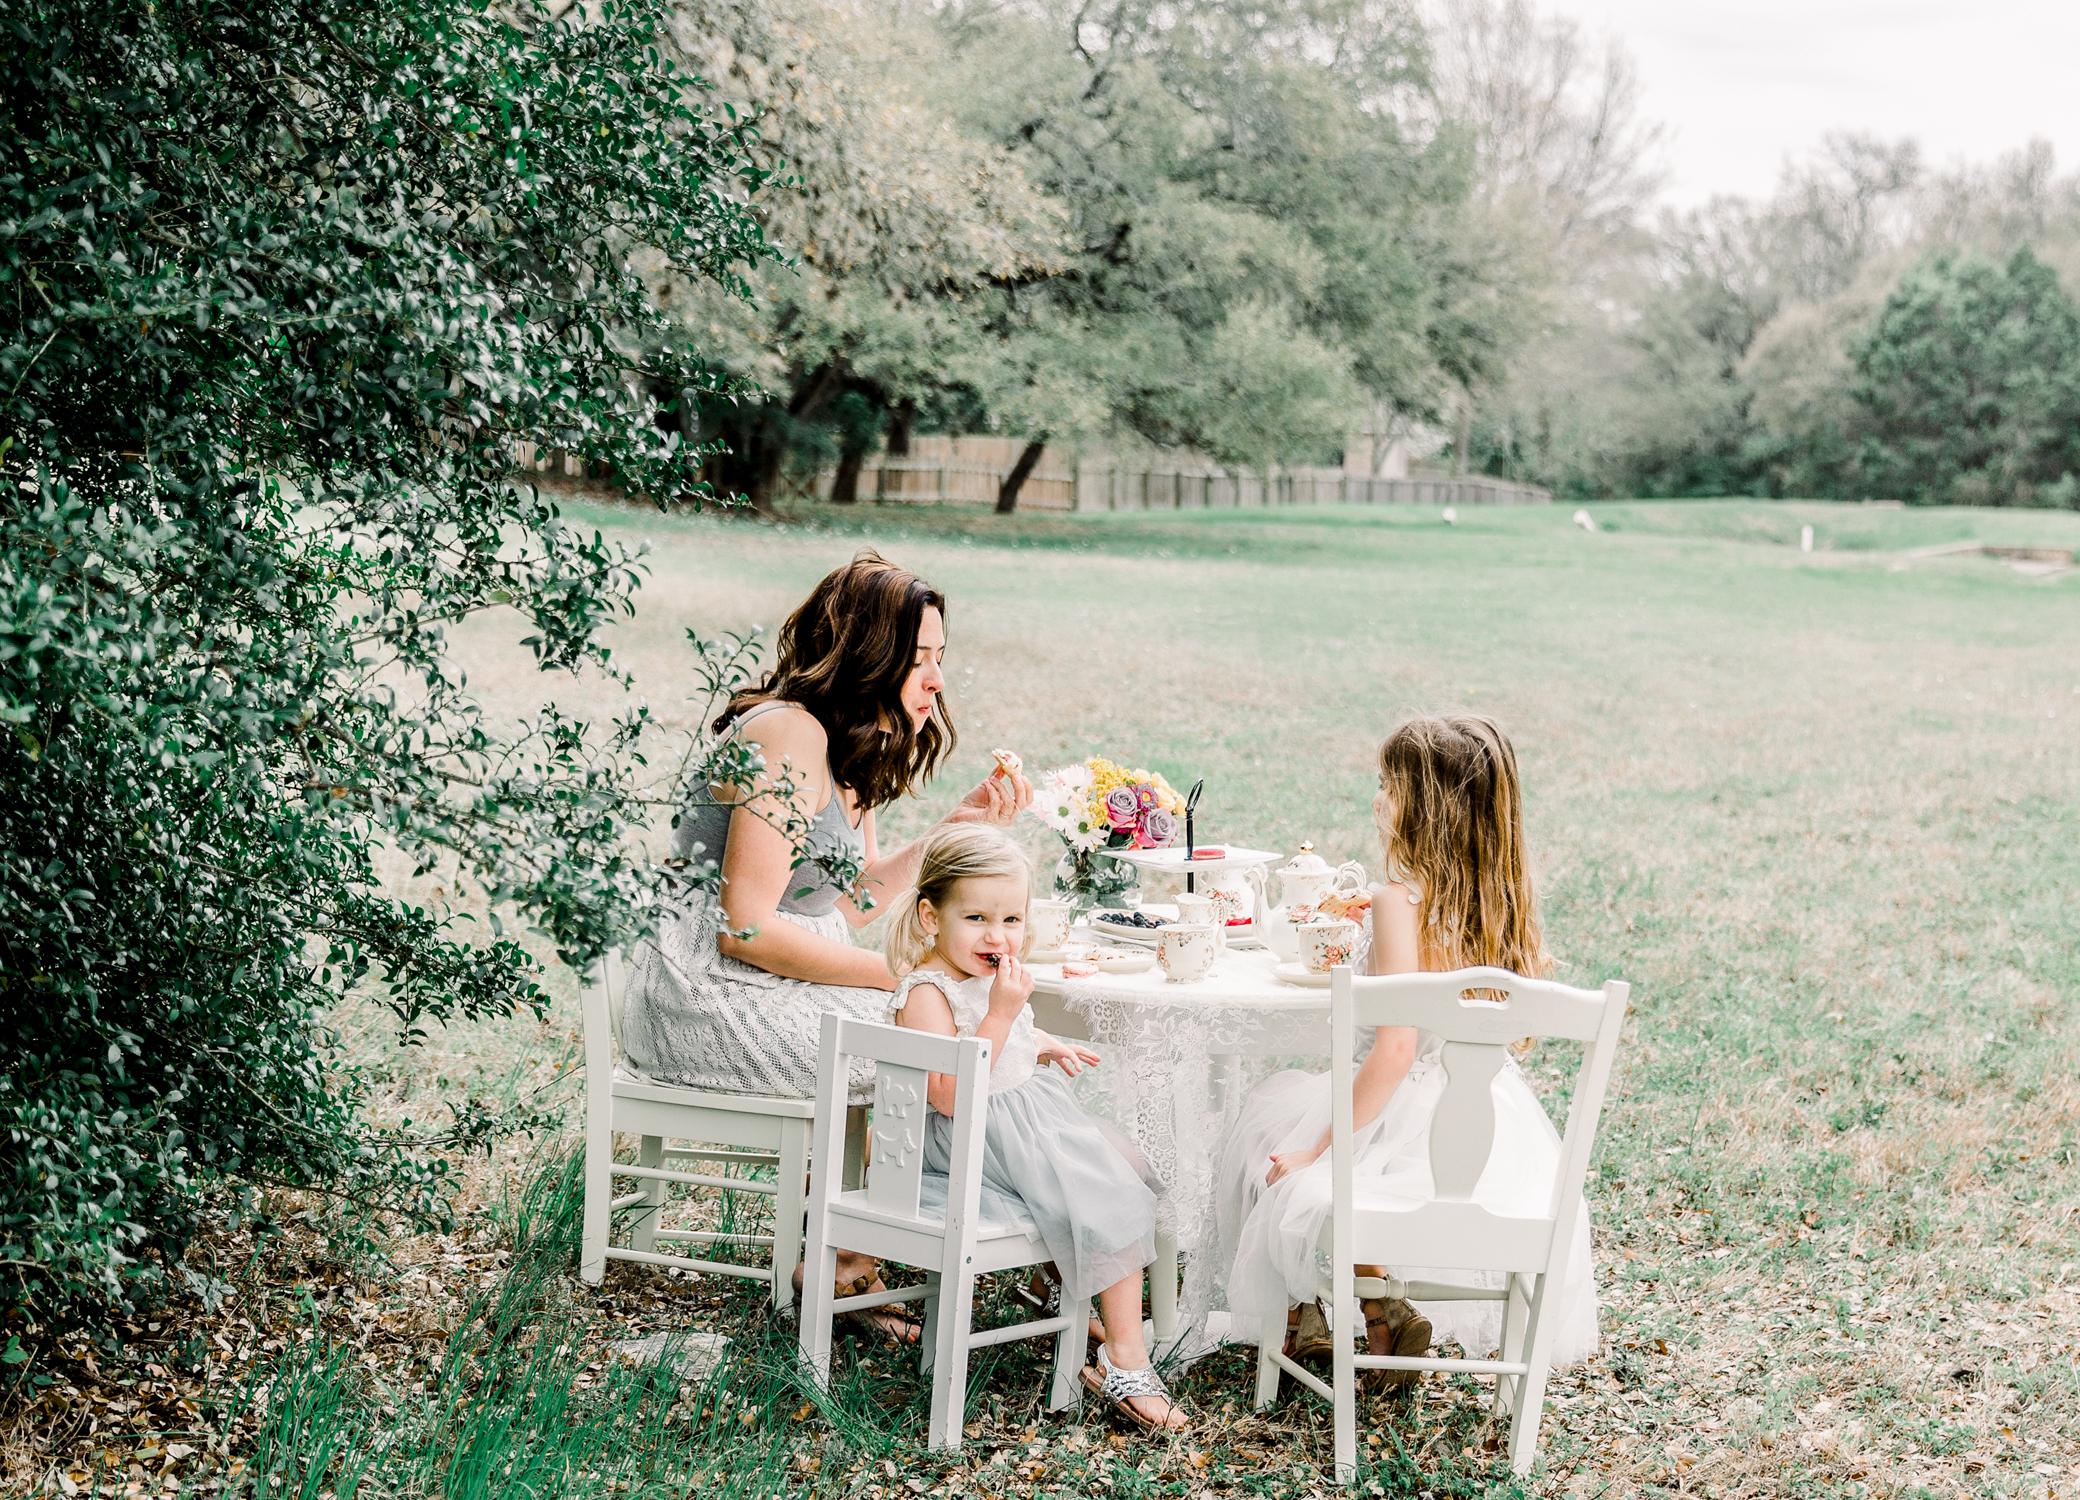 lifestyle-family-photographer-franklin-tea-time-9.jpg